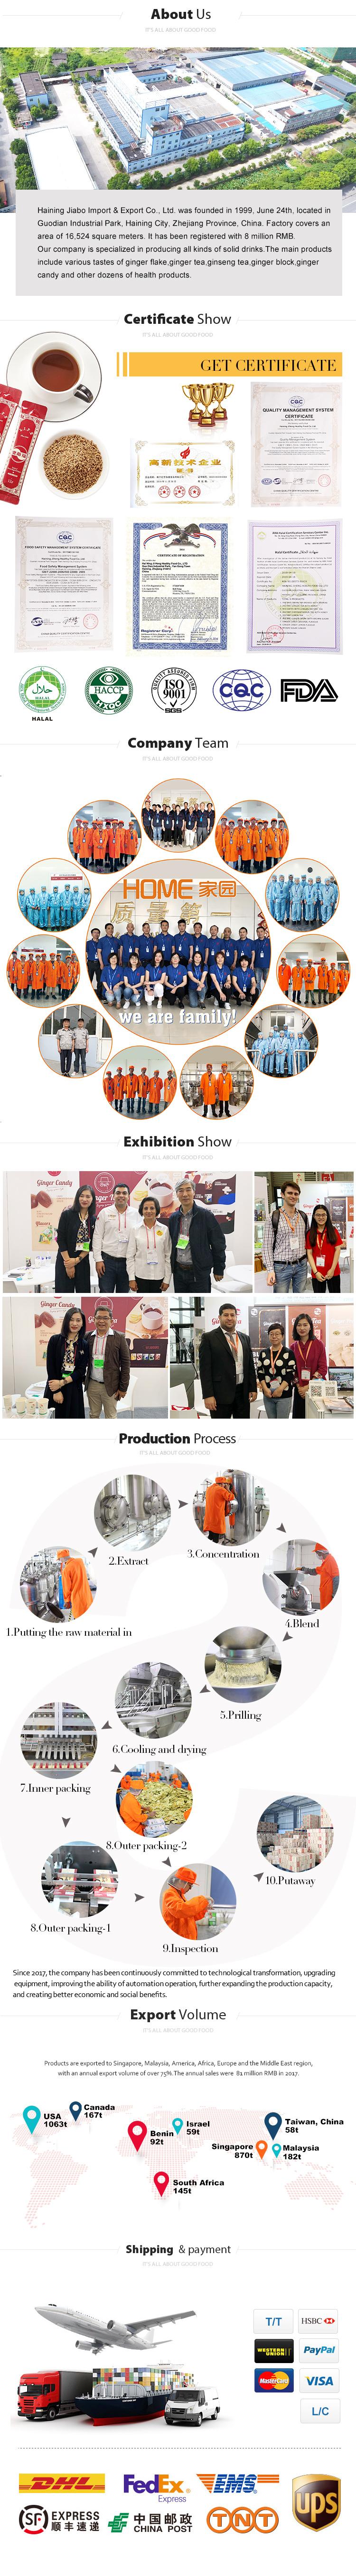 hot sale Chinese factory ginger drink instant honey ginger tea powder bag honey flavour tea powder - 4uTea | 4uTea.com